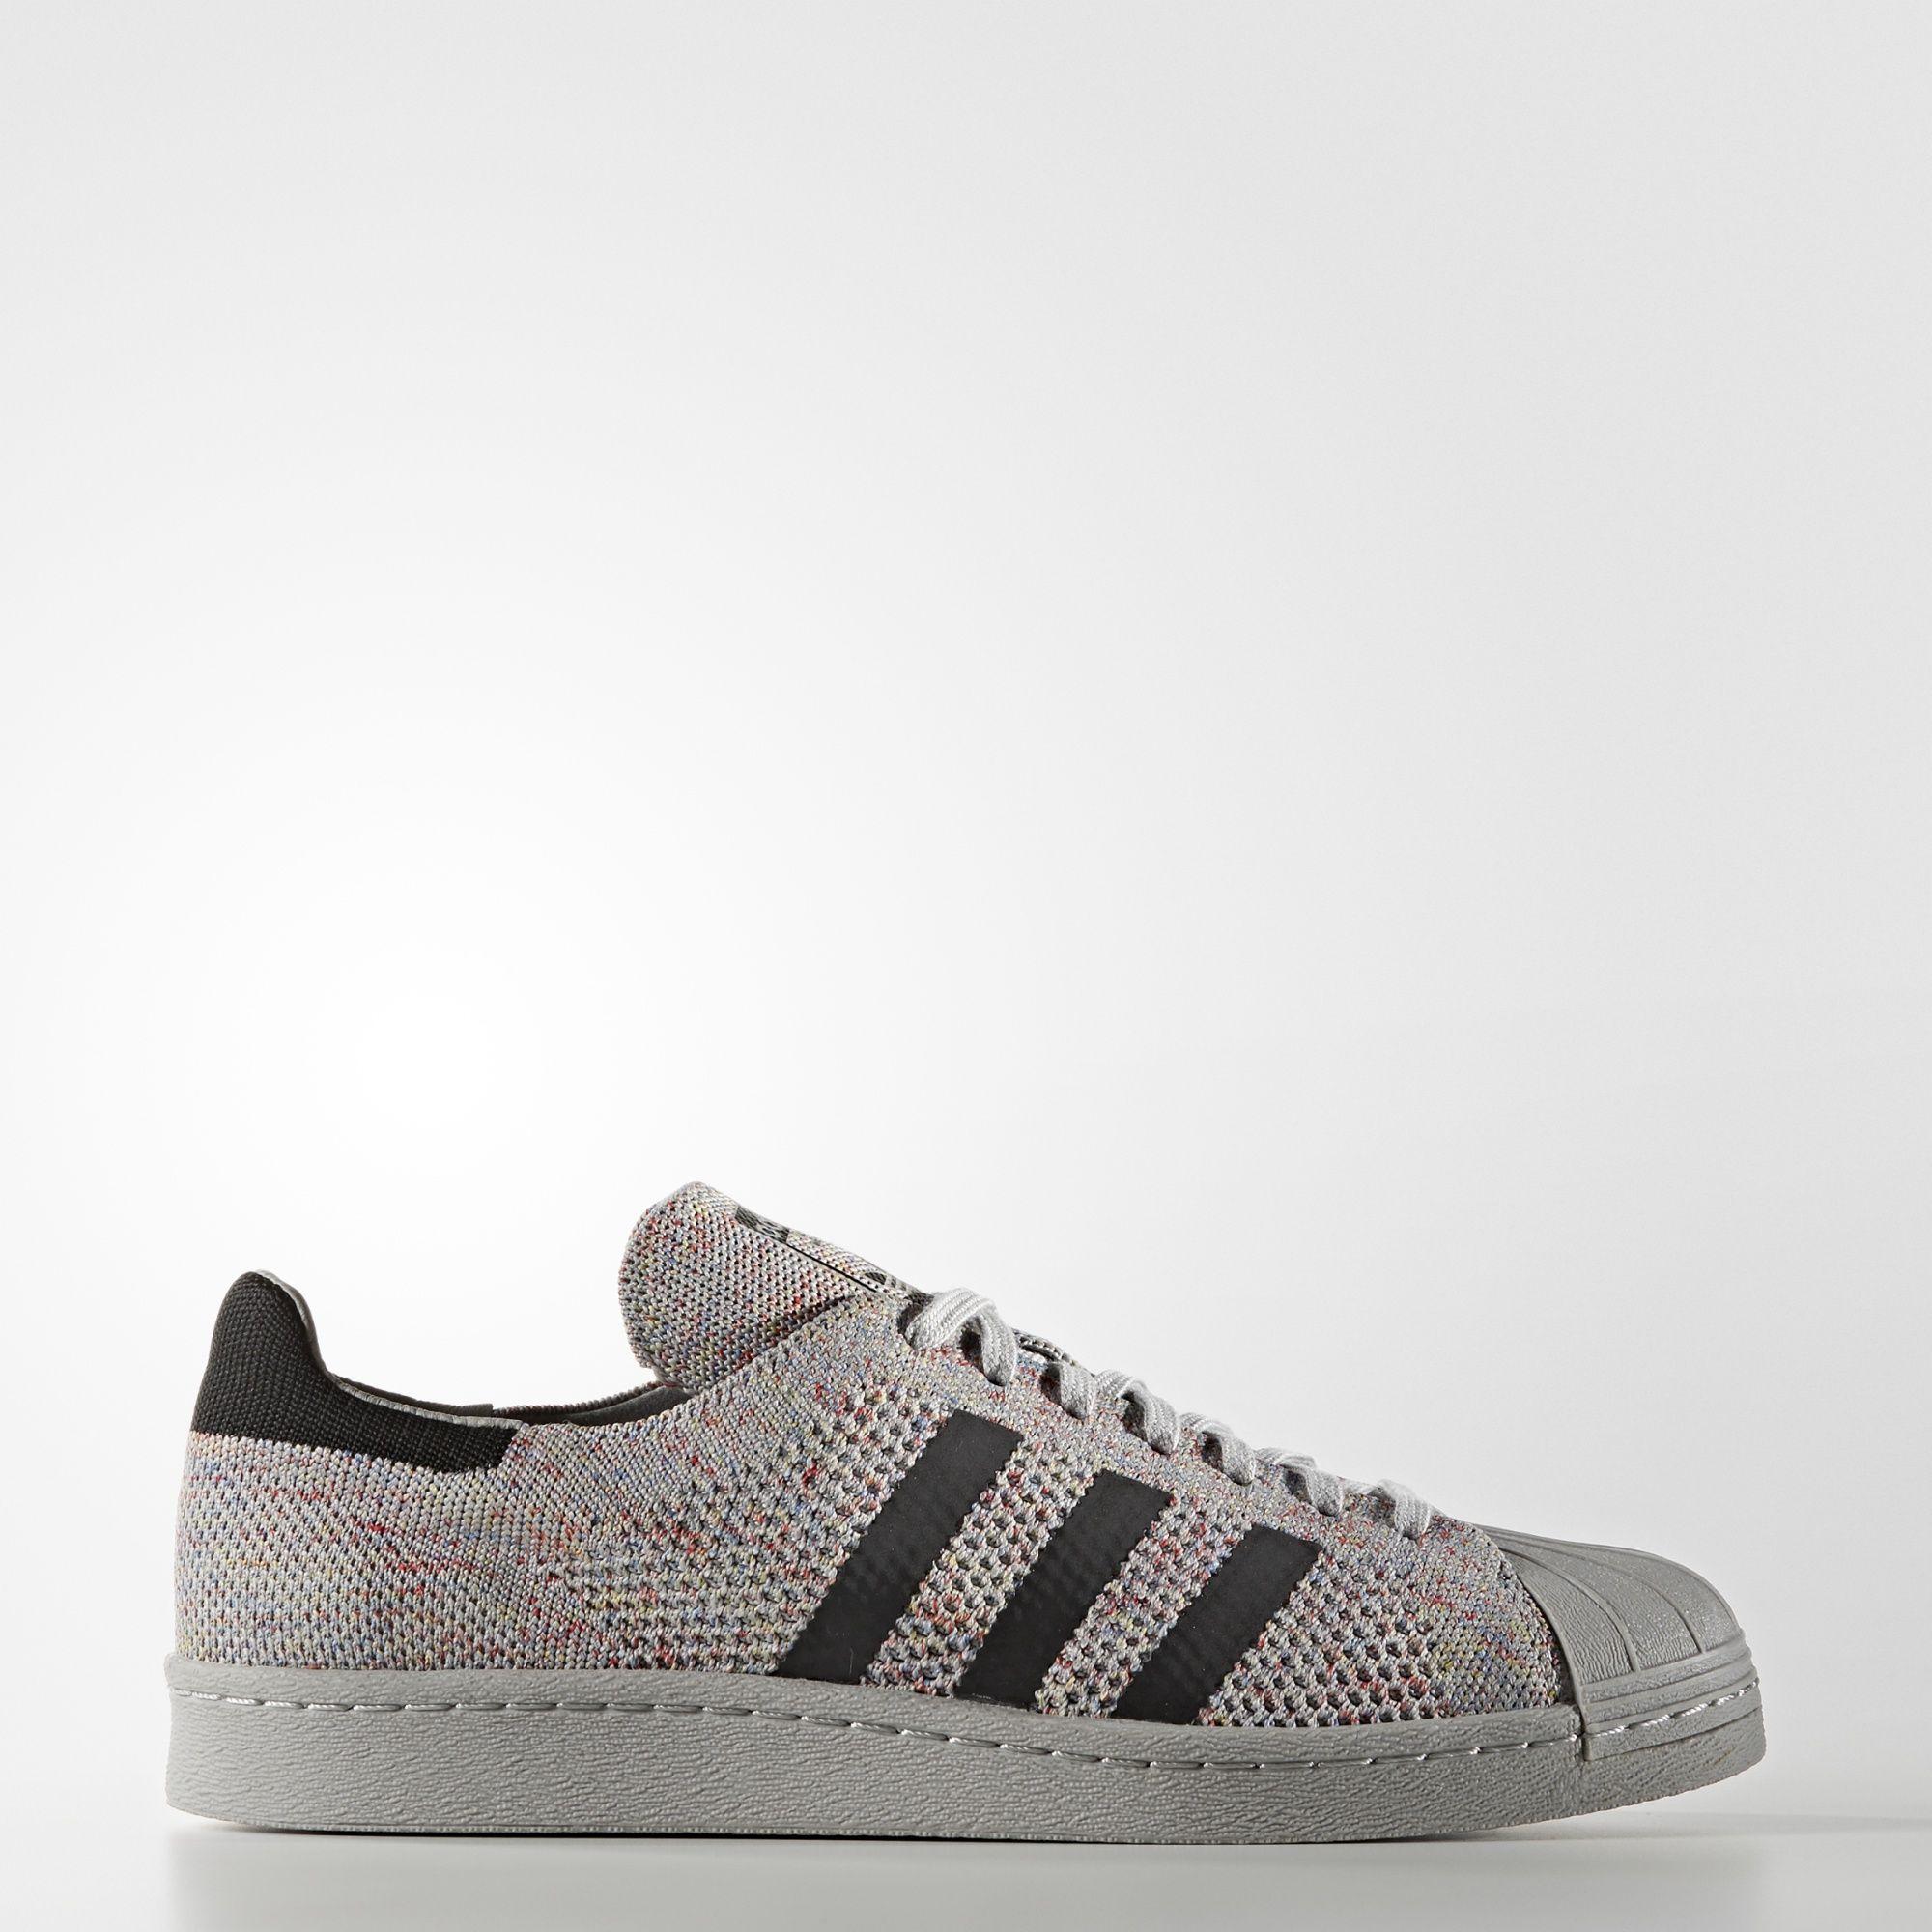 adidas Superstar 80s Primeknit Multicolor Sneaker Bar Detroit